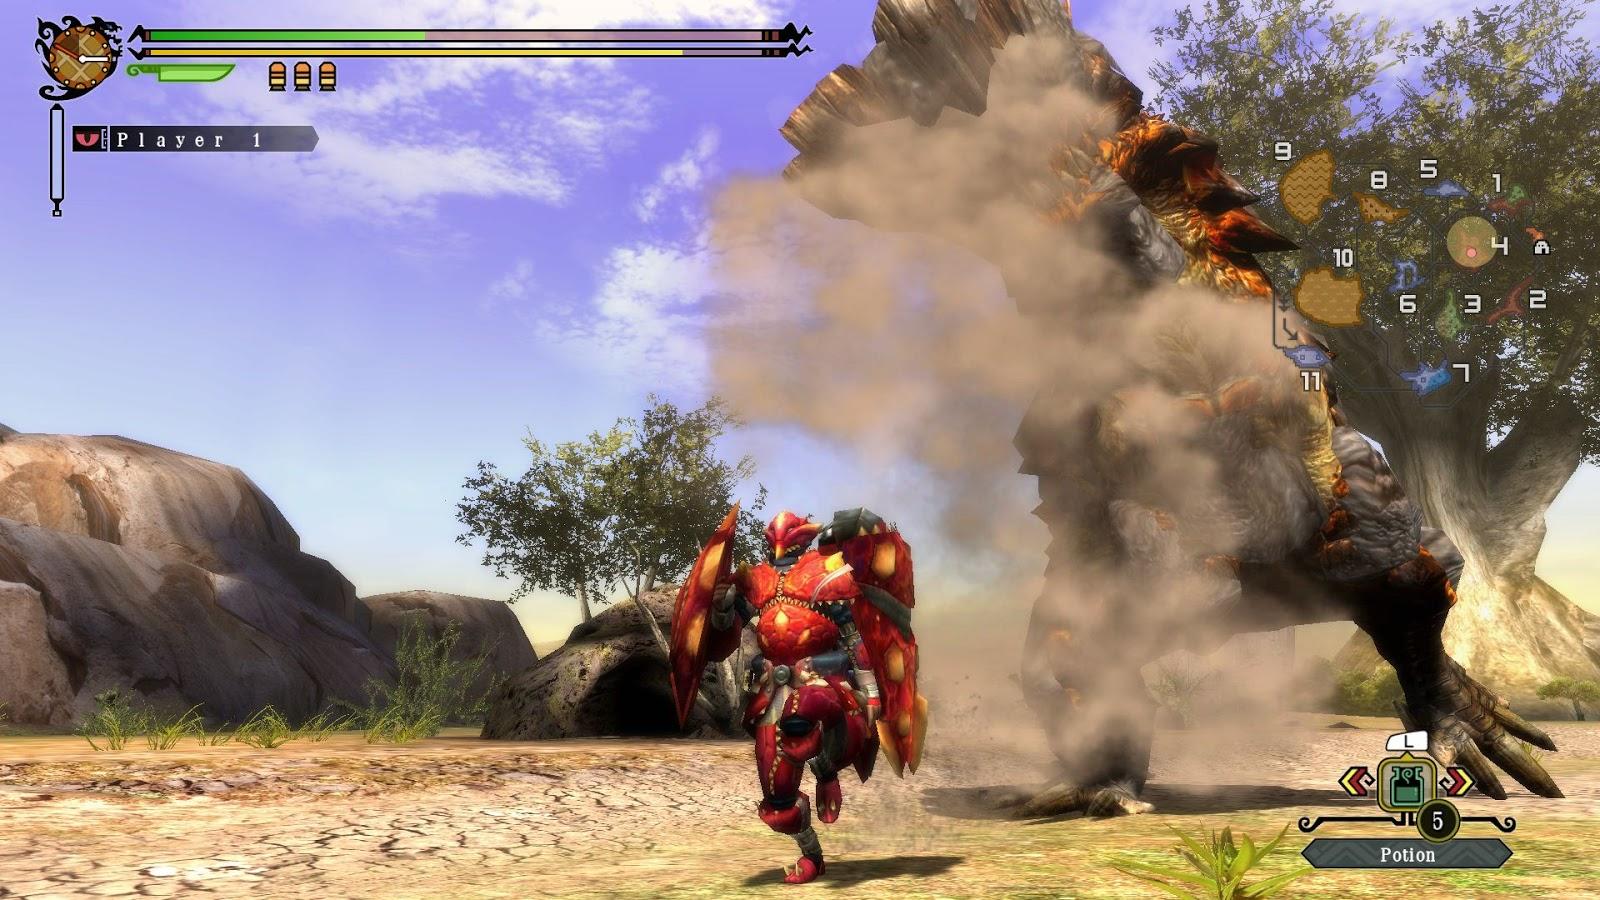 Sword man monster hunter for pc – free download.